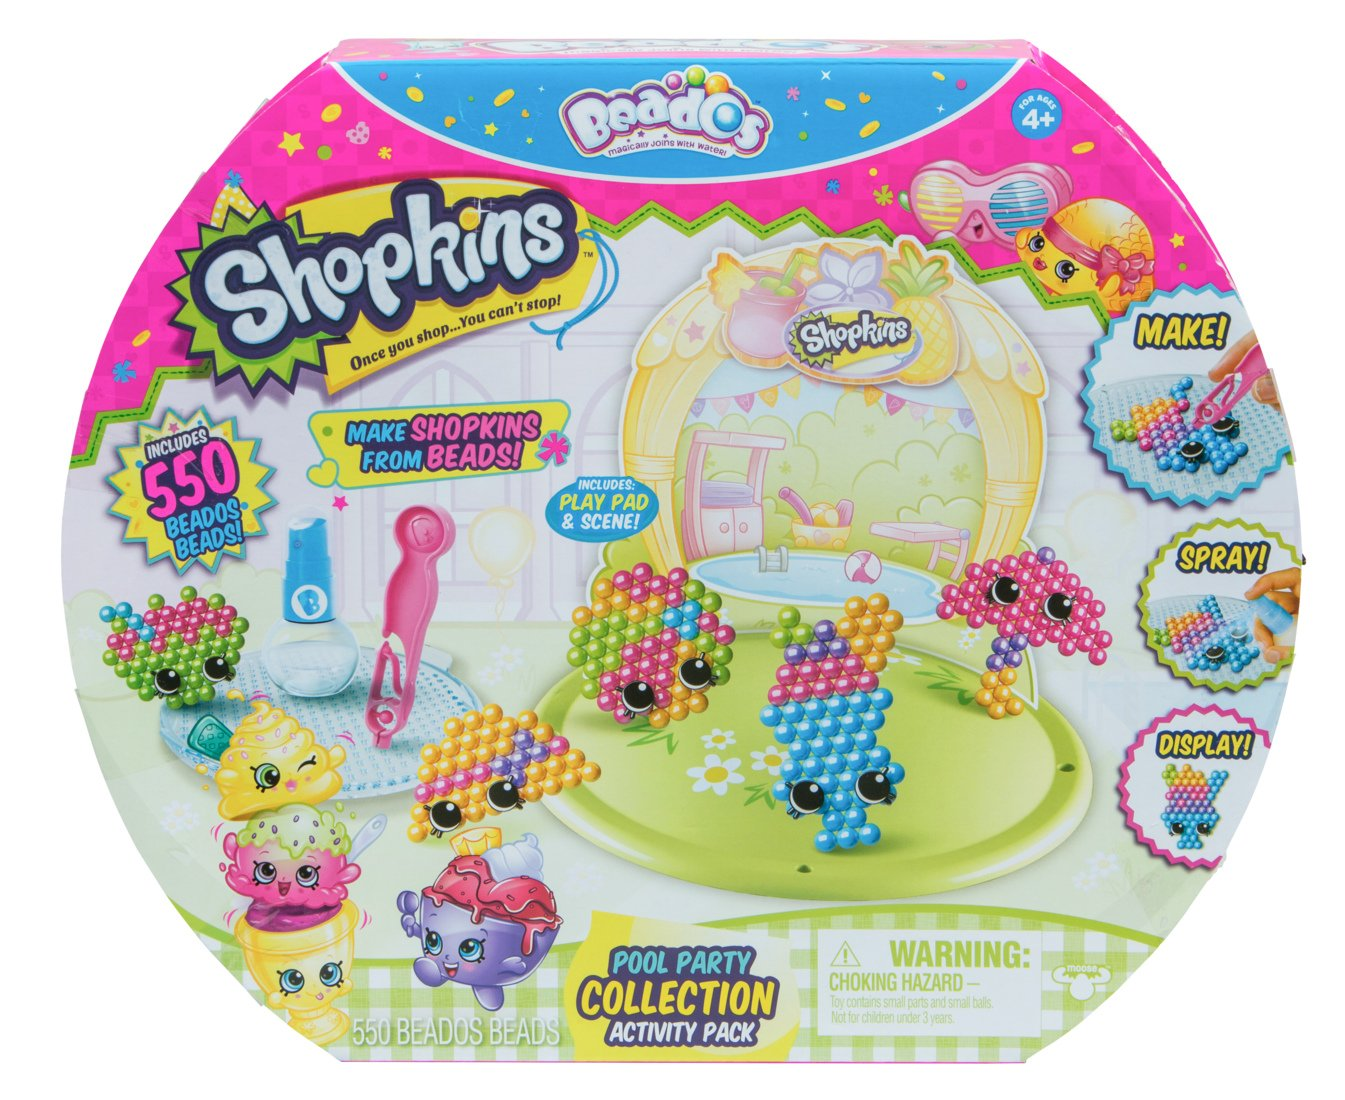 Beados Season 7 Shopkins Activity Pack - Pool Party